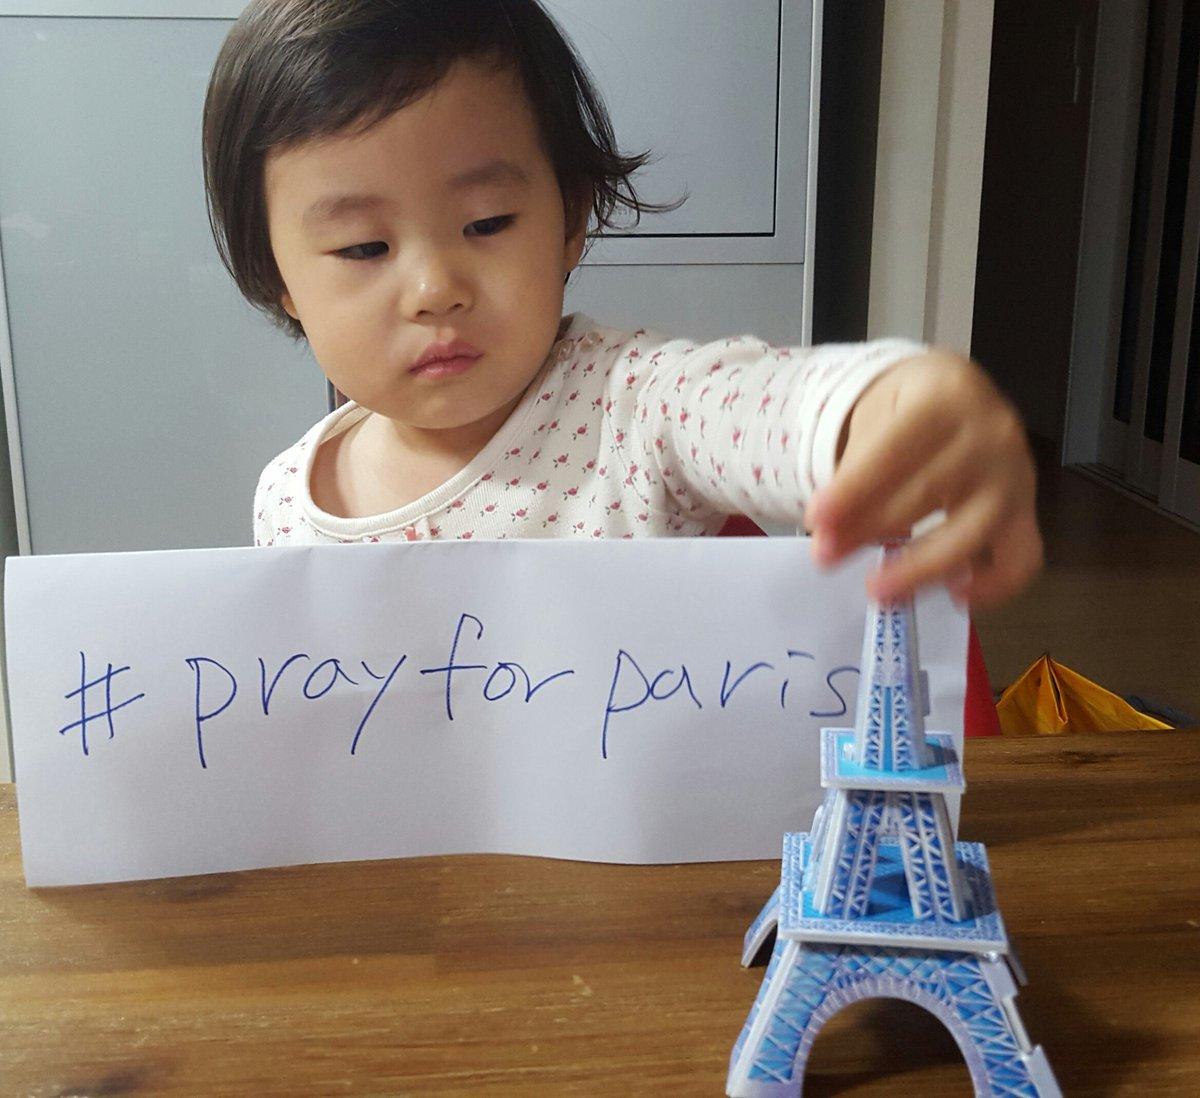 #Prayers4Paris from Korea. https://t.co/bj8suq79tN